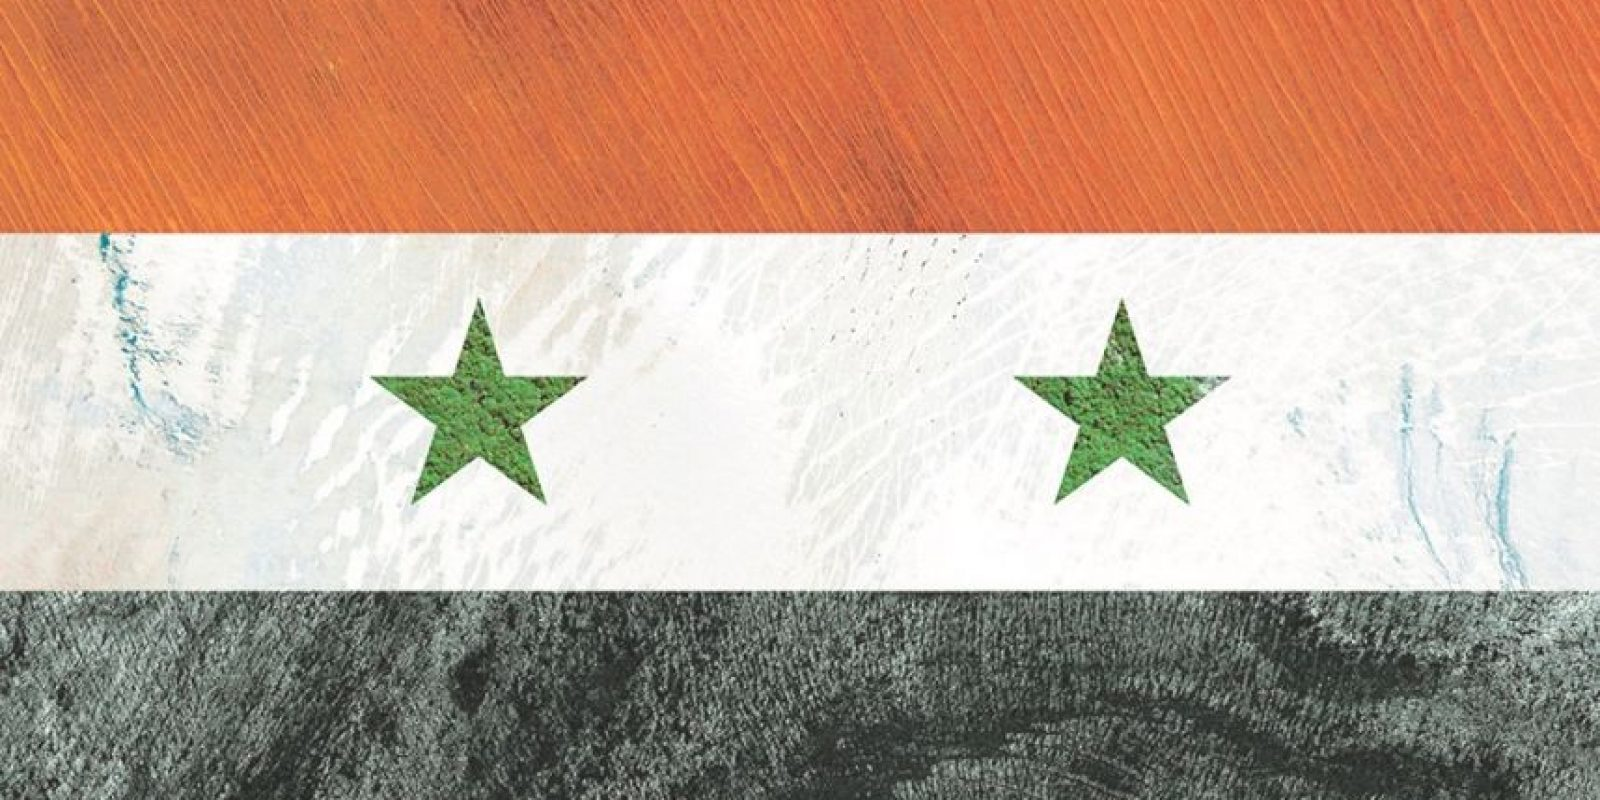 Bandera de Siria – Fotografía satelital: Australia, Groenlandia, Polinesia Francesa e Islandia